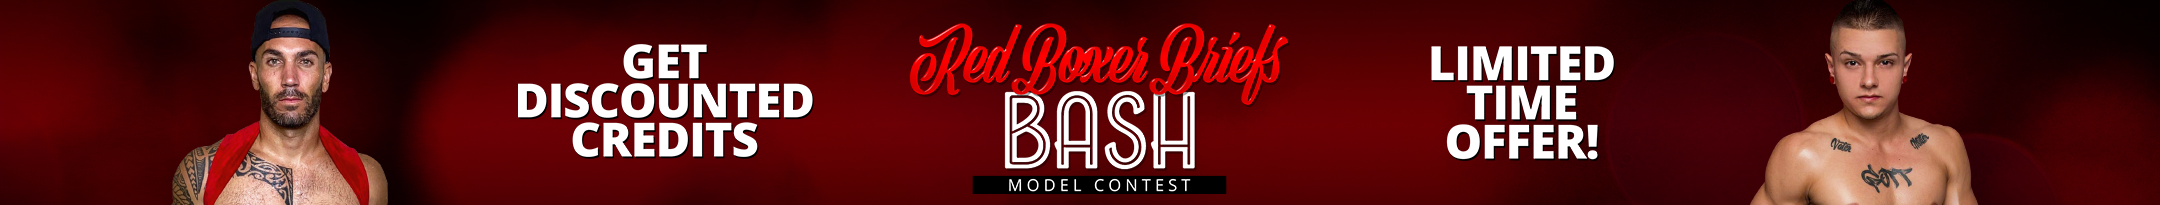 Red Boxer Briefs Bash Discount Promo